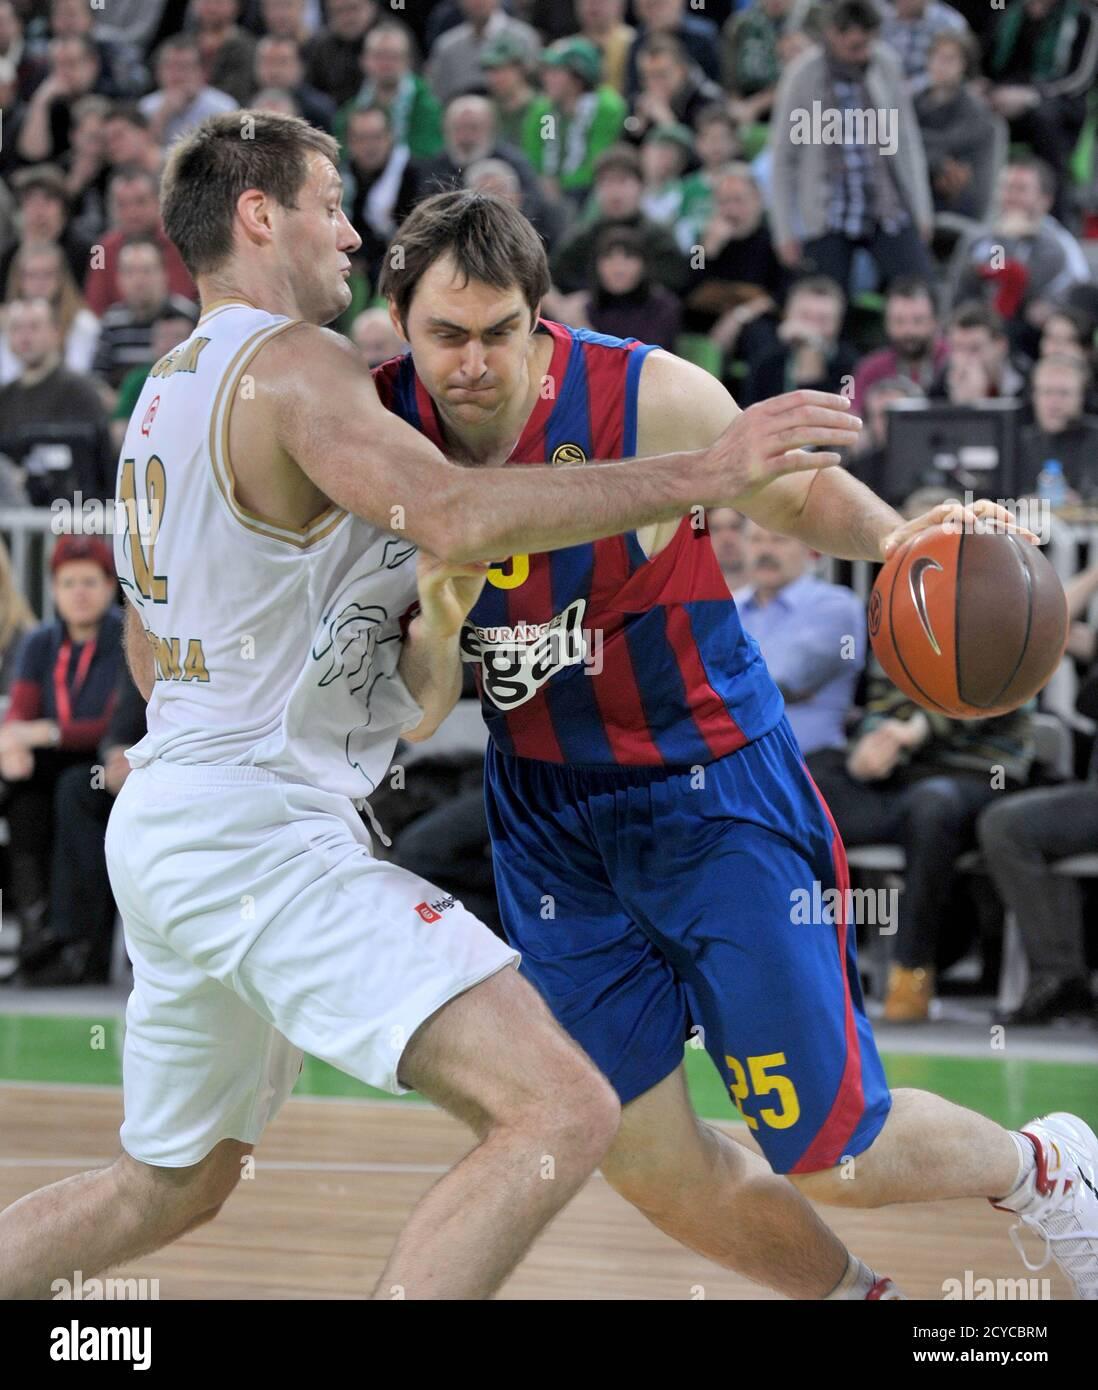 Goran Jagodnik of Union Olimpija  challenges Erazem Lorbek  (R) of Regal Barcelona during their men's Euroleague basketball group B game  in Ljubljana Janurary 27, 2011. REUTERS/ISrdjan Zivulovic (SLOVENIA - Tags: SPORT BASKETBALL) Foto Stock